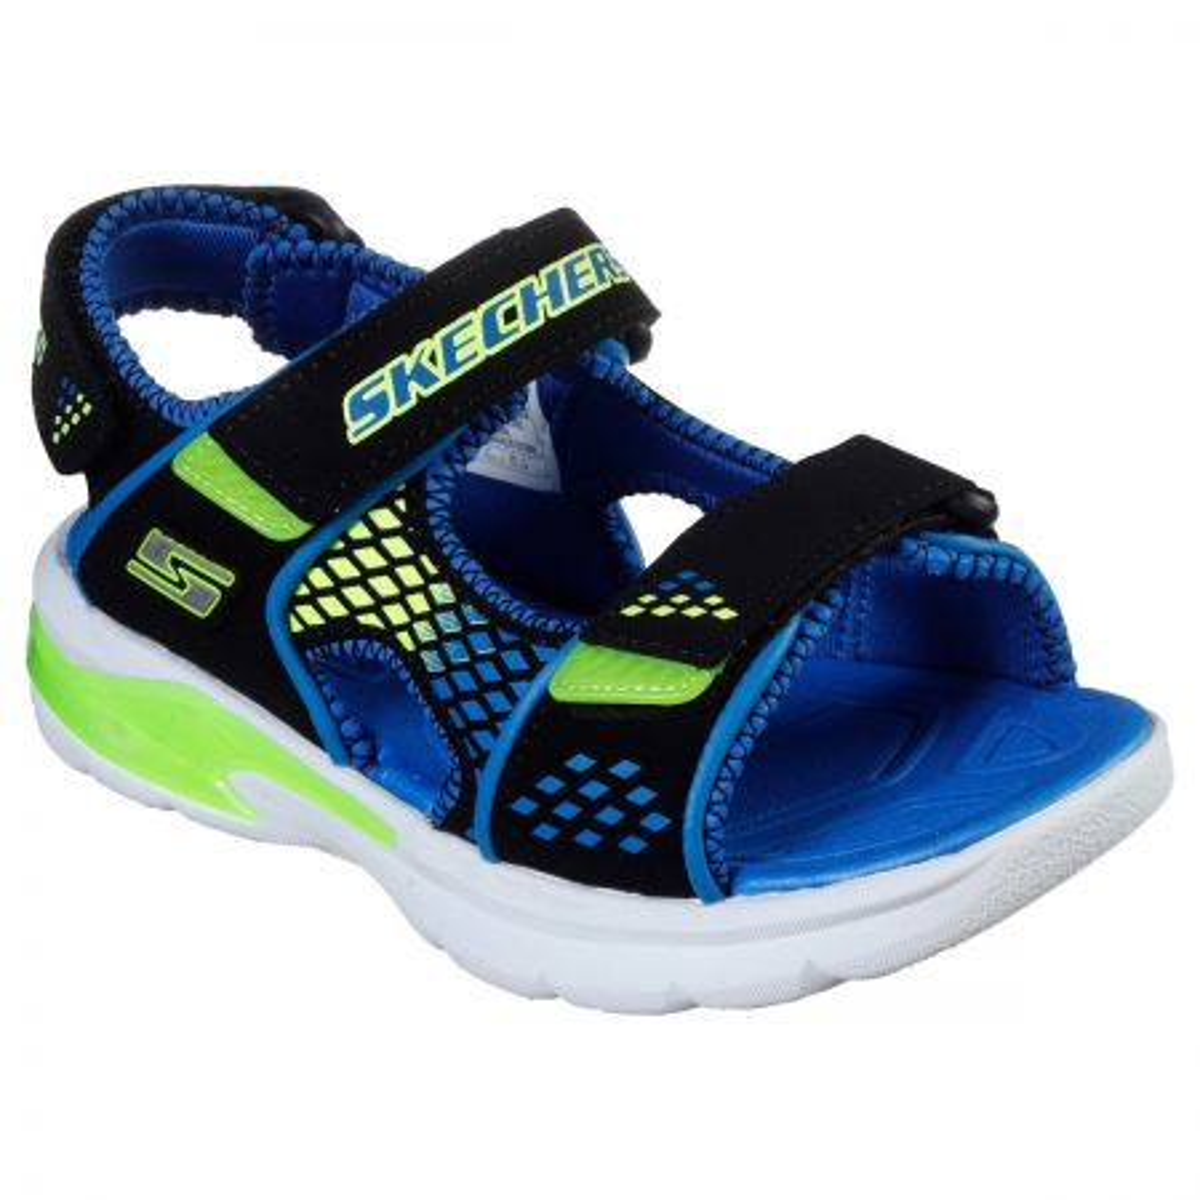 Skechers E - Ii Sandal - Beach sandale